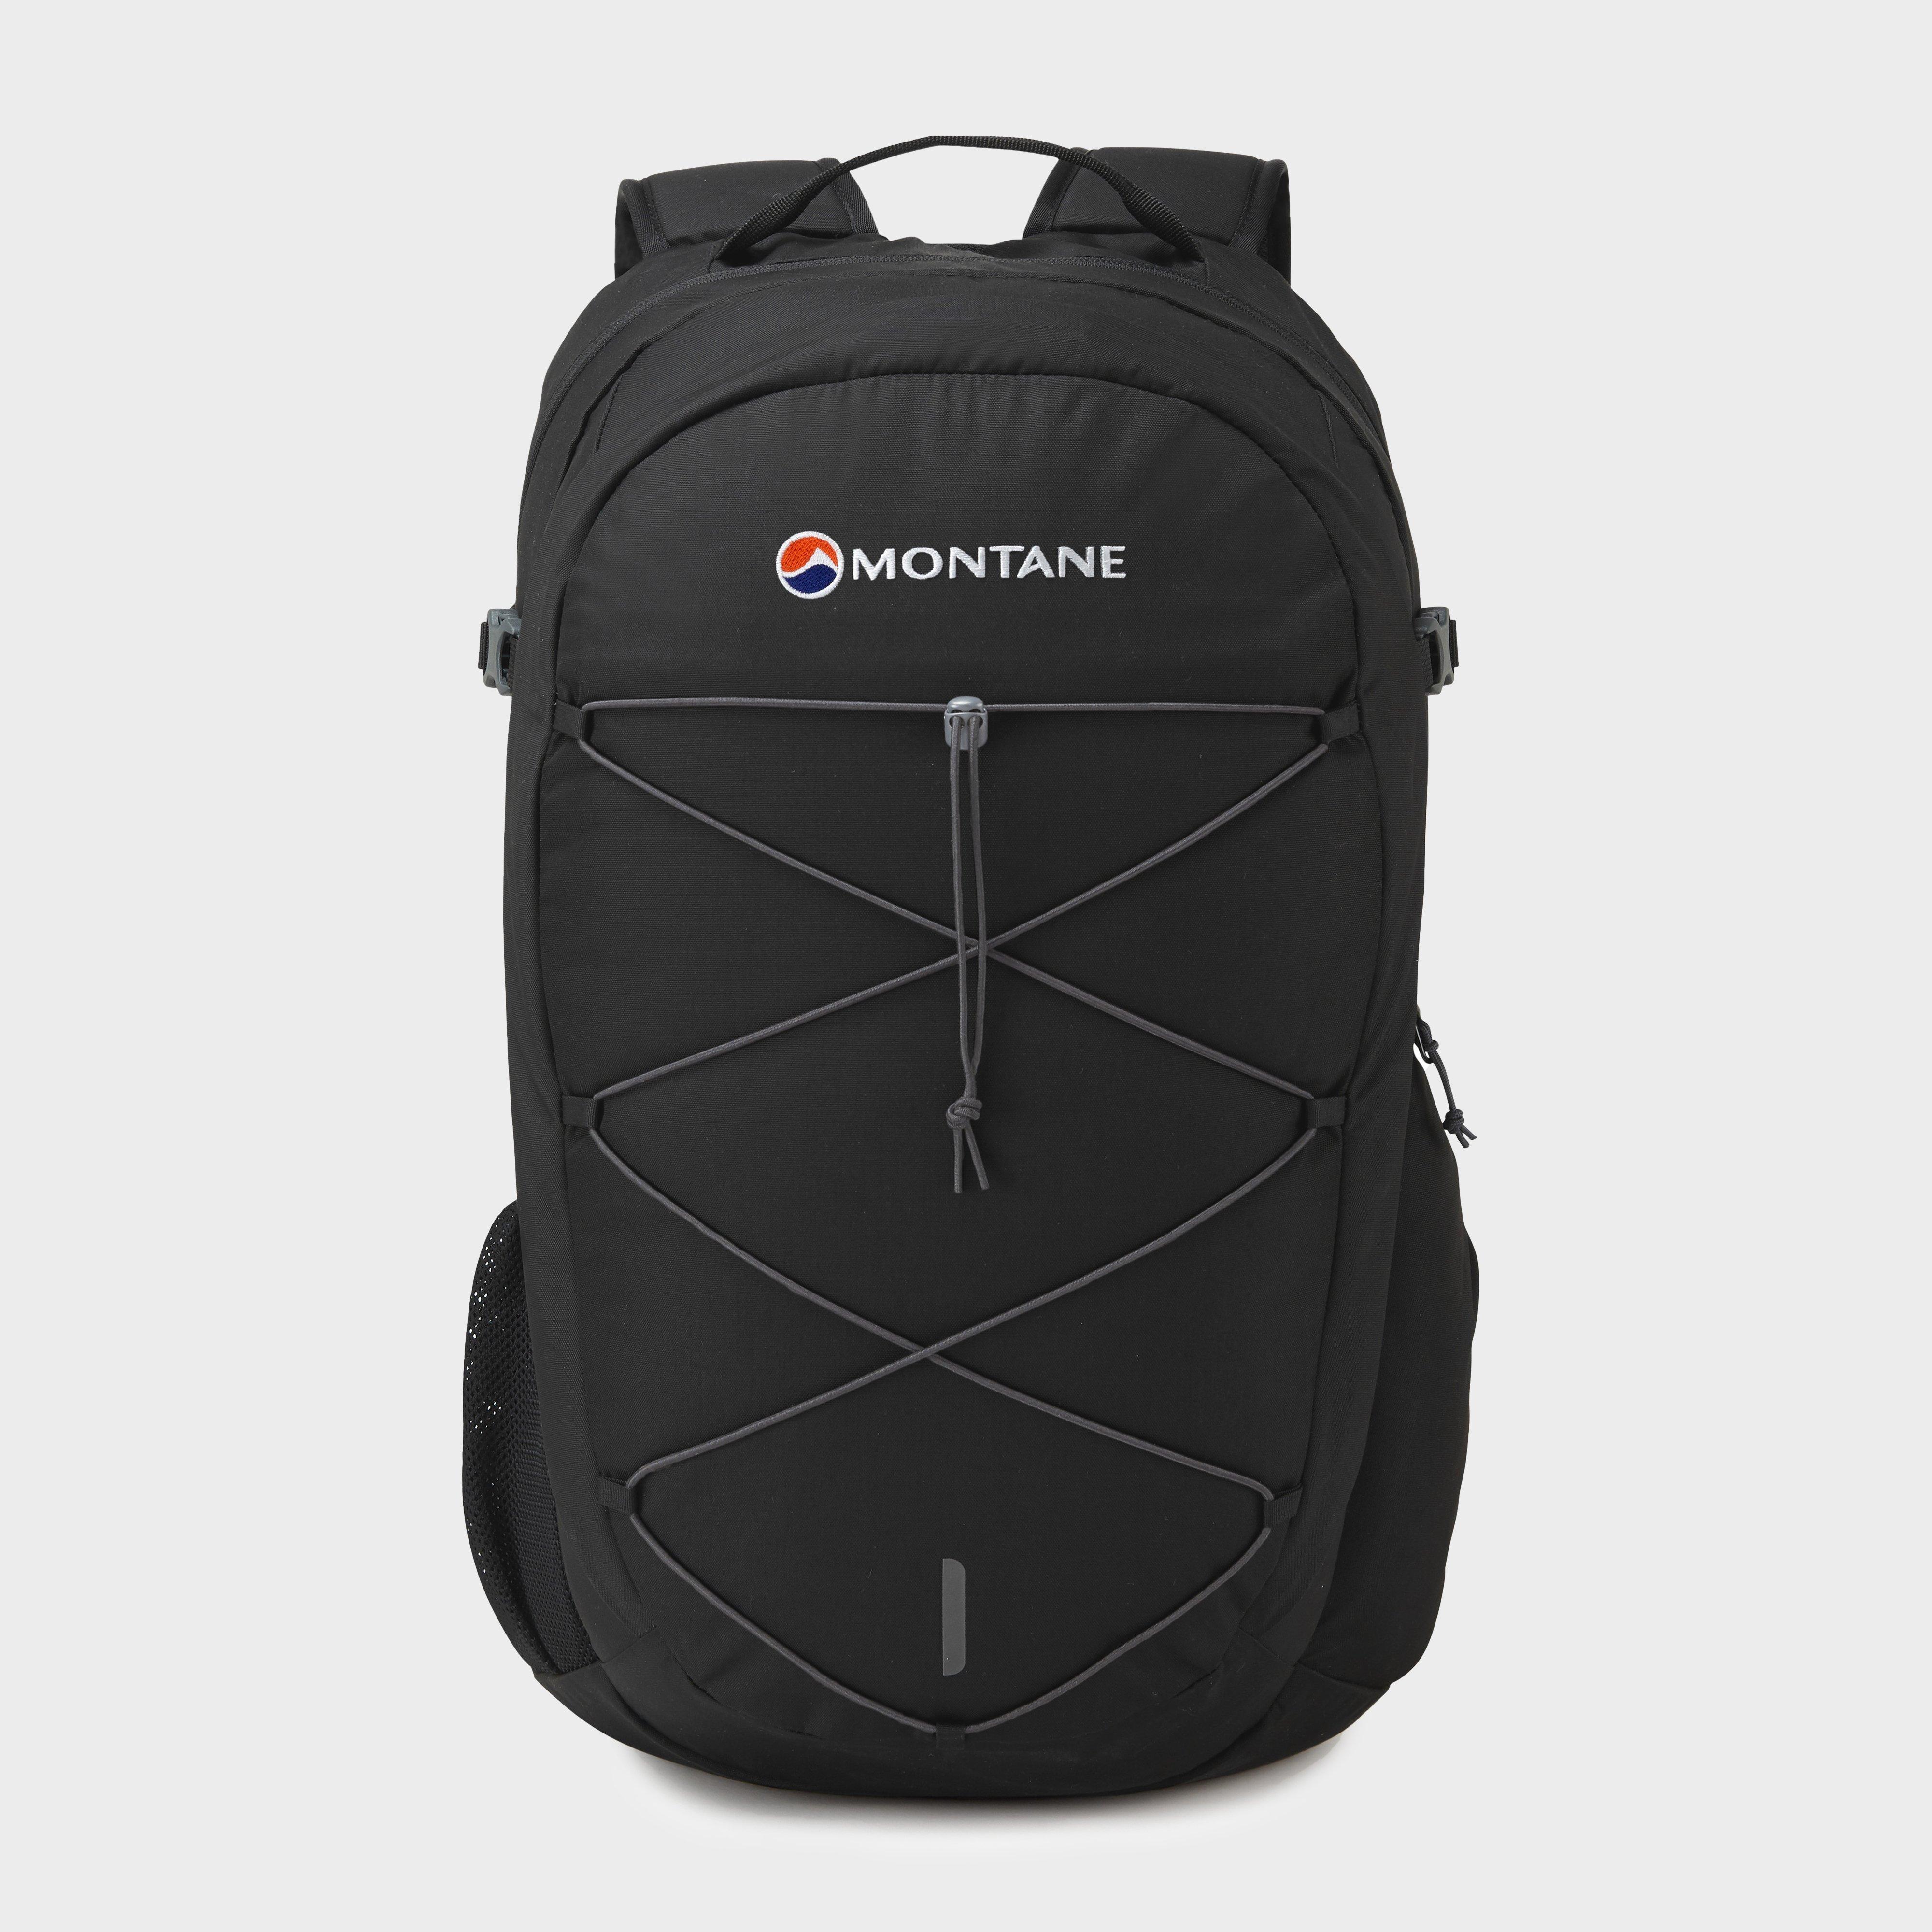 Montane Switch 30 Daypack, Black